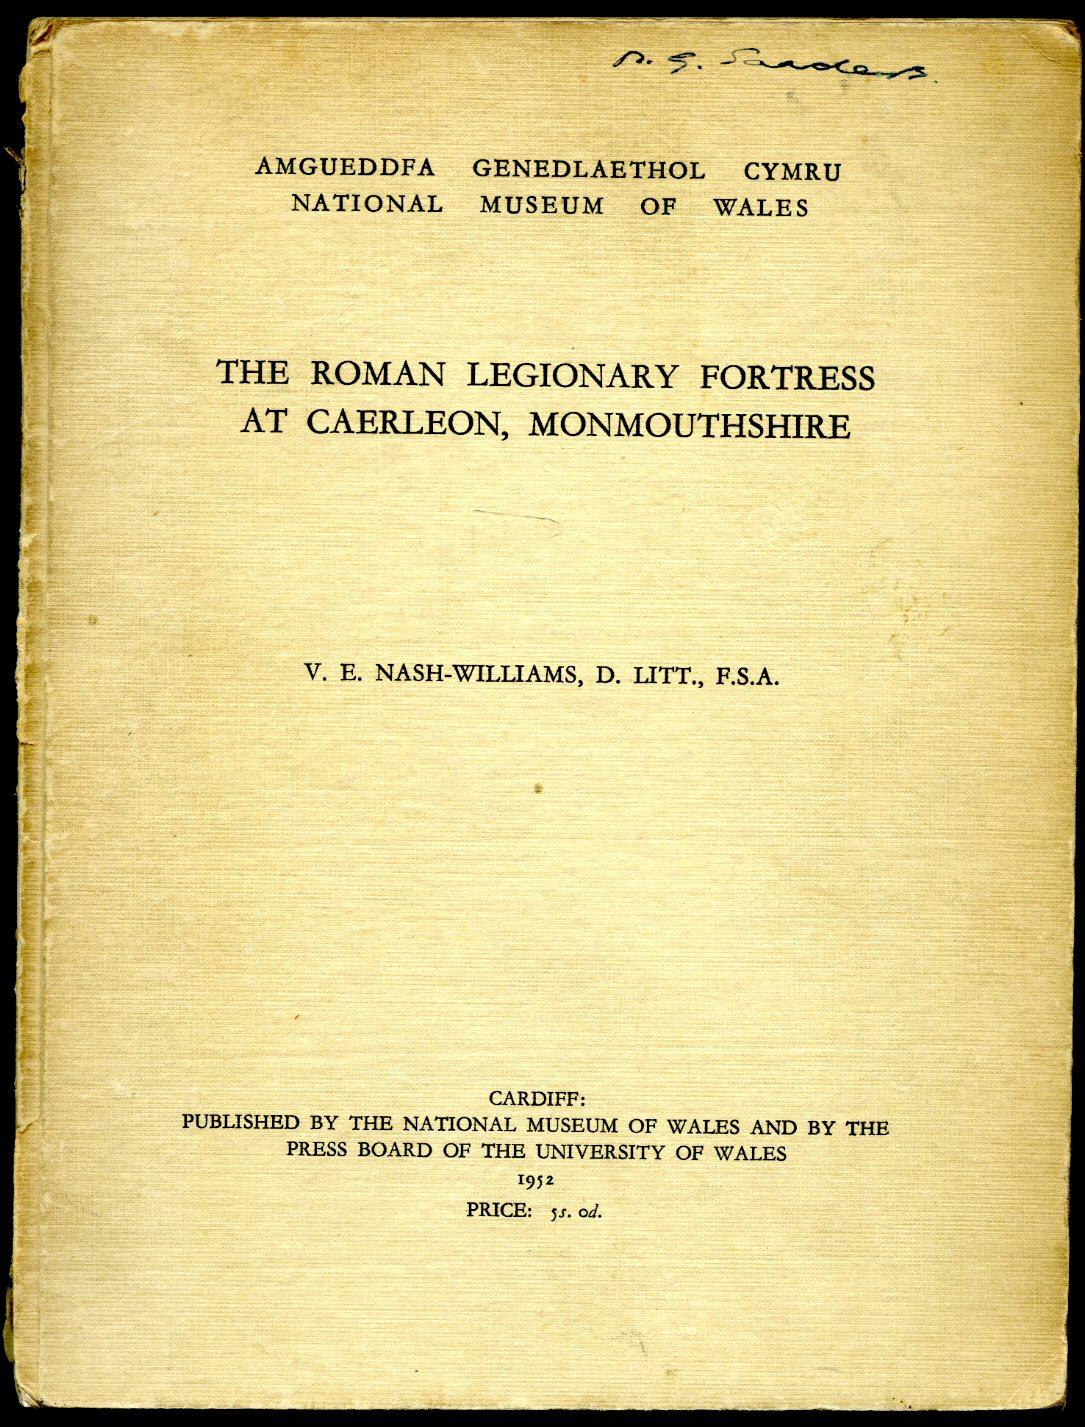 NASH-WILLIAMS, V. E. - The Roman Legionary Fortress at Caerleon, Monmouthshire